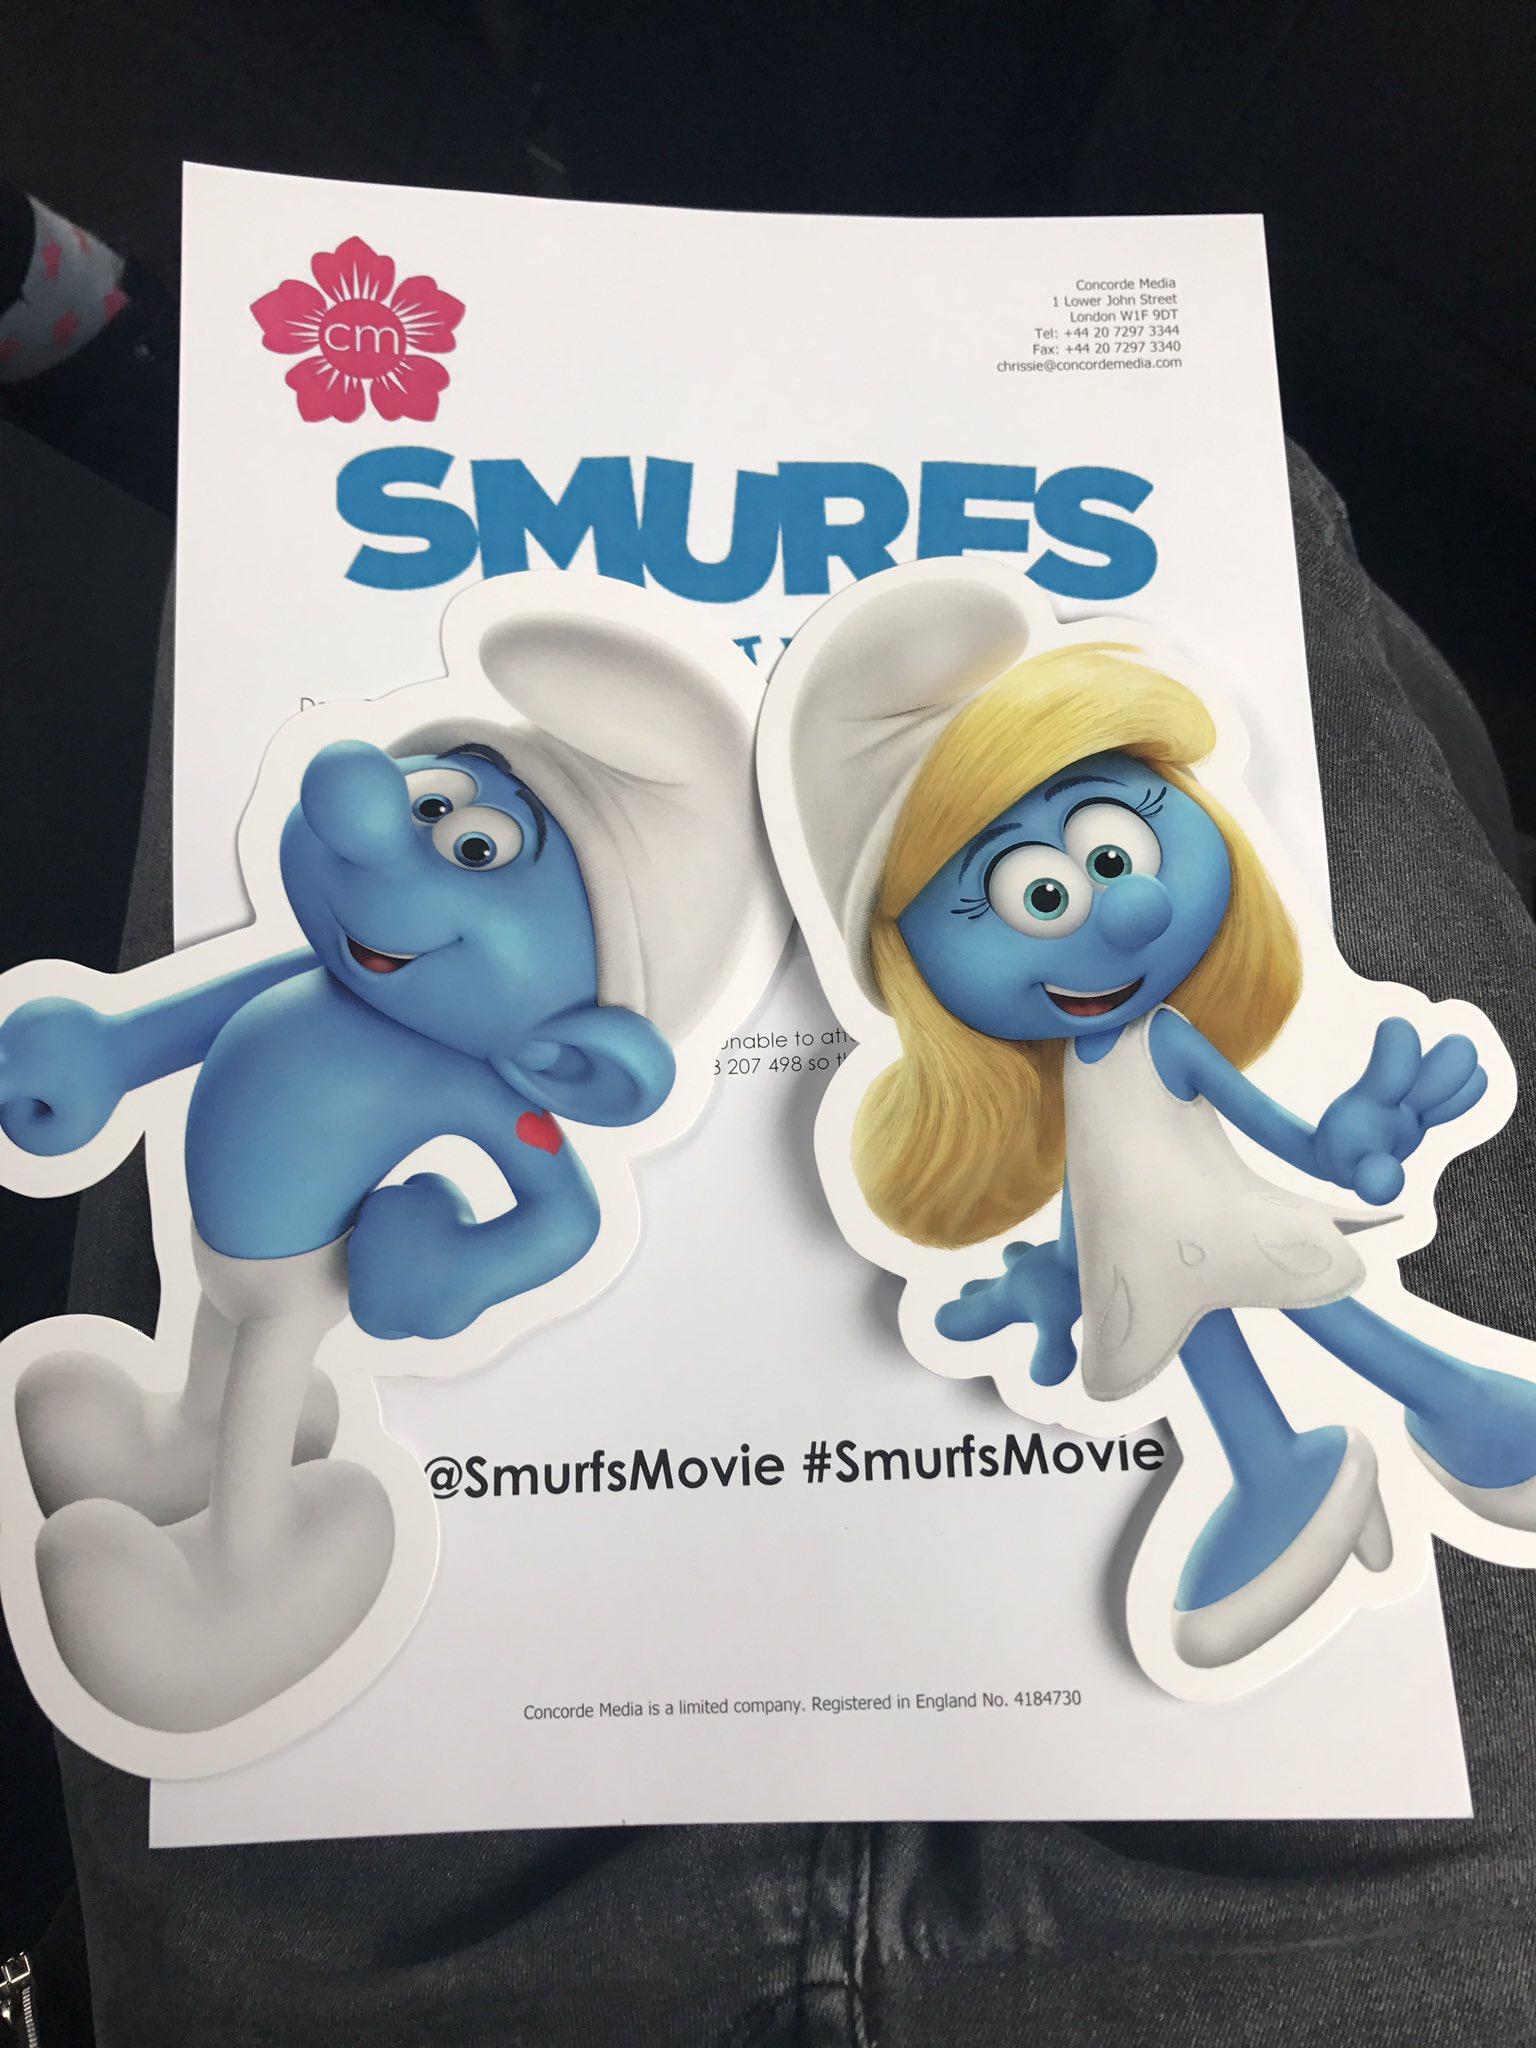 On our way to @SmurfsMovie premiere #SmurfsMovie - Daddy Daughter red carpet Date ❤️💙 https://t.co/qFLdbGYwSe